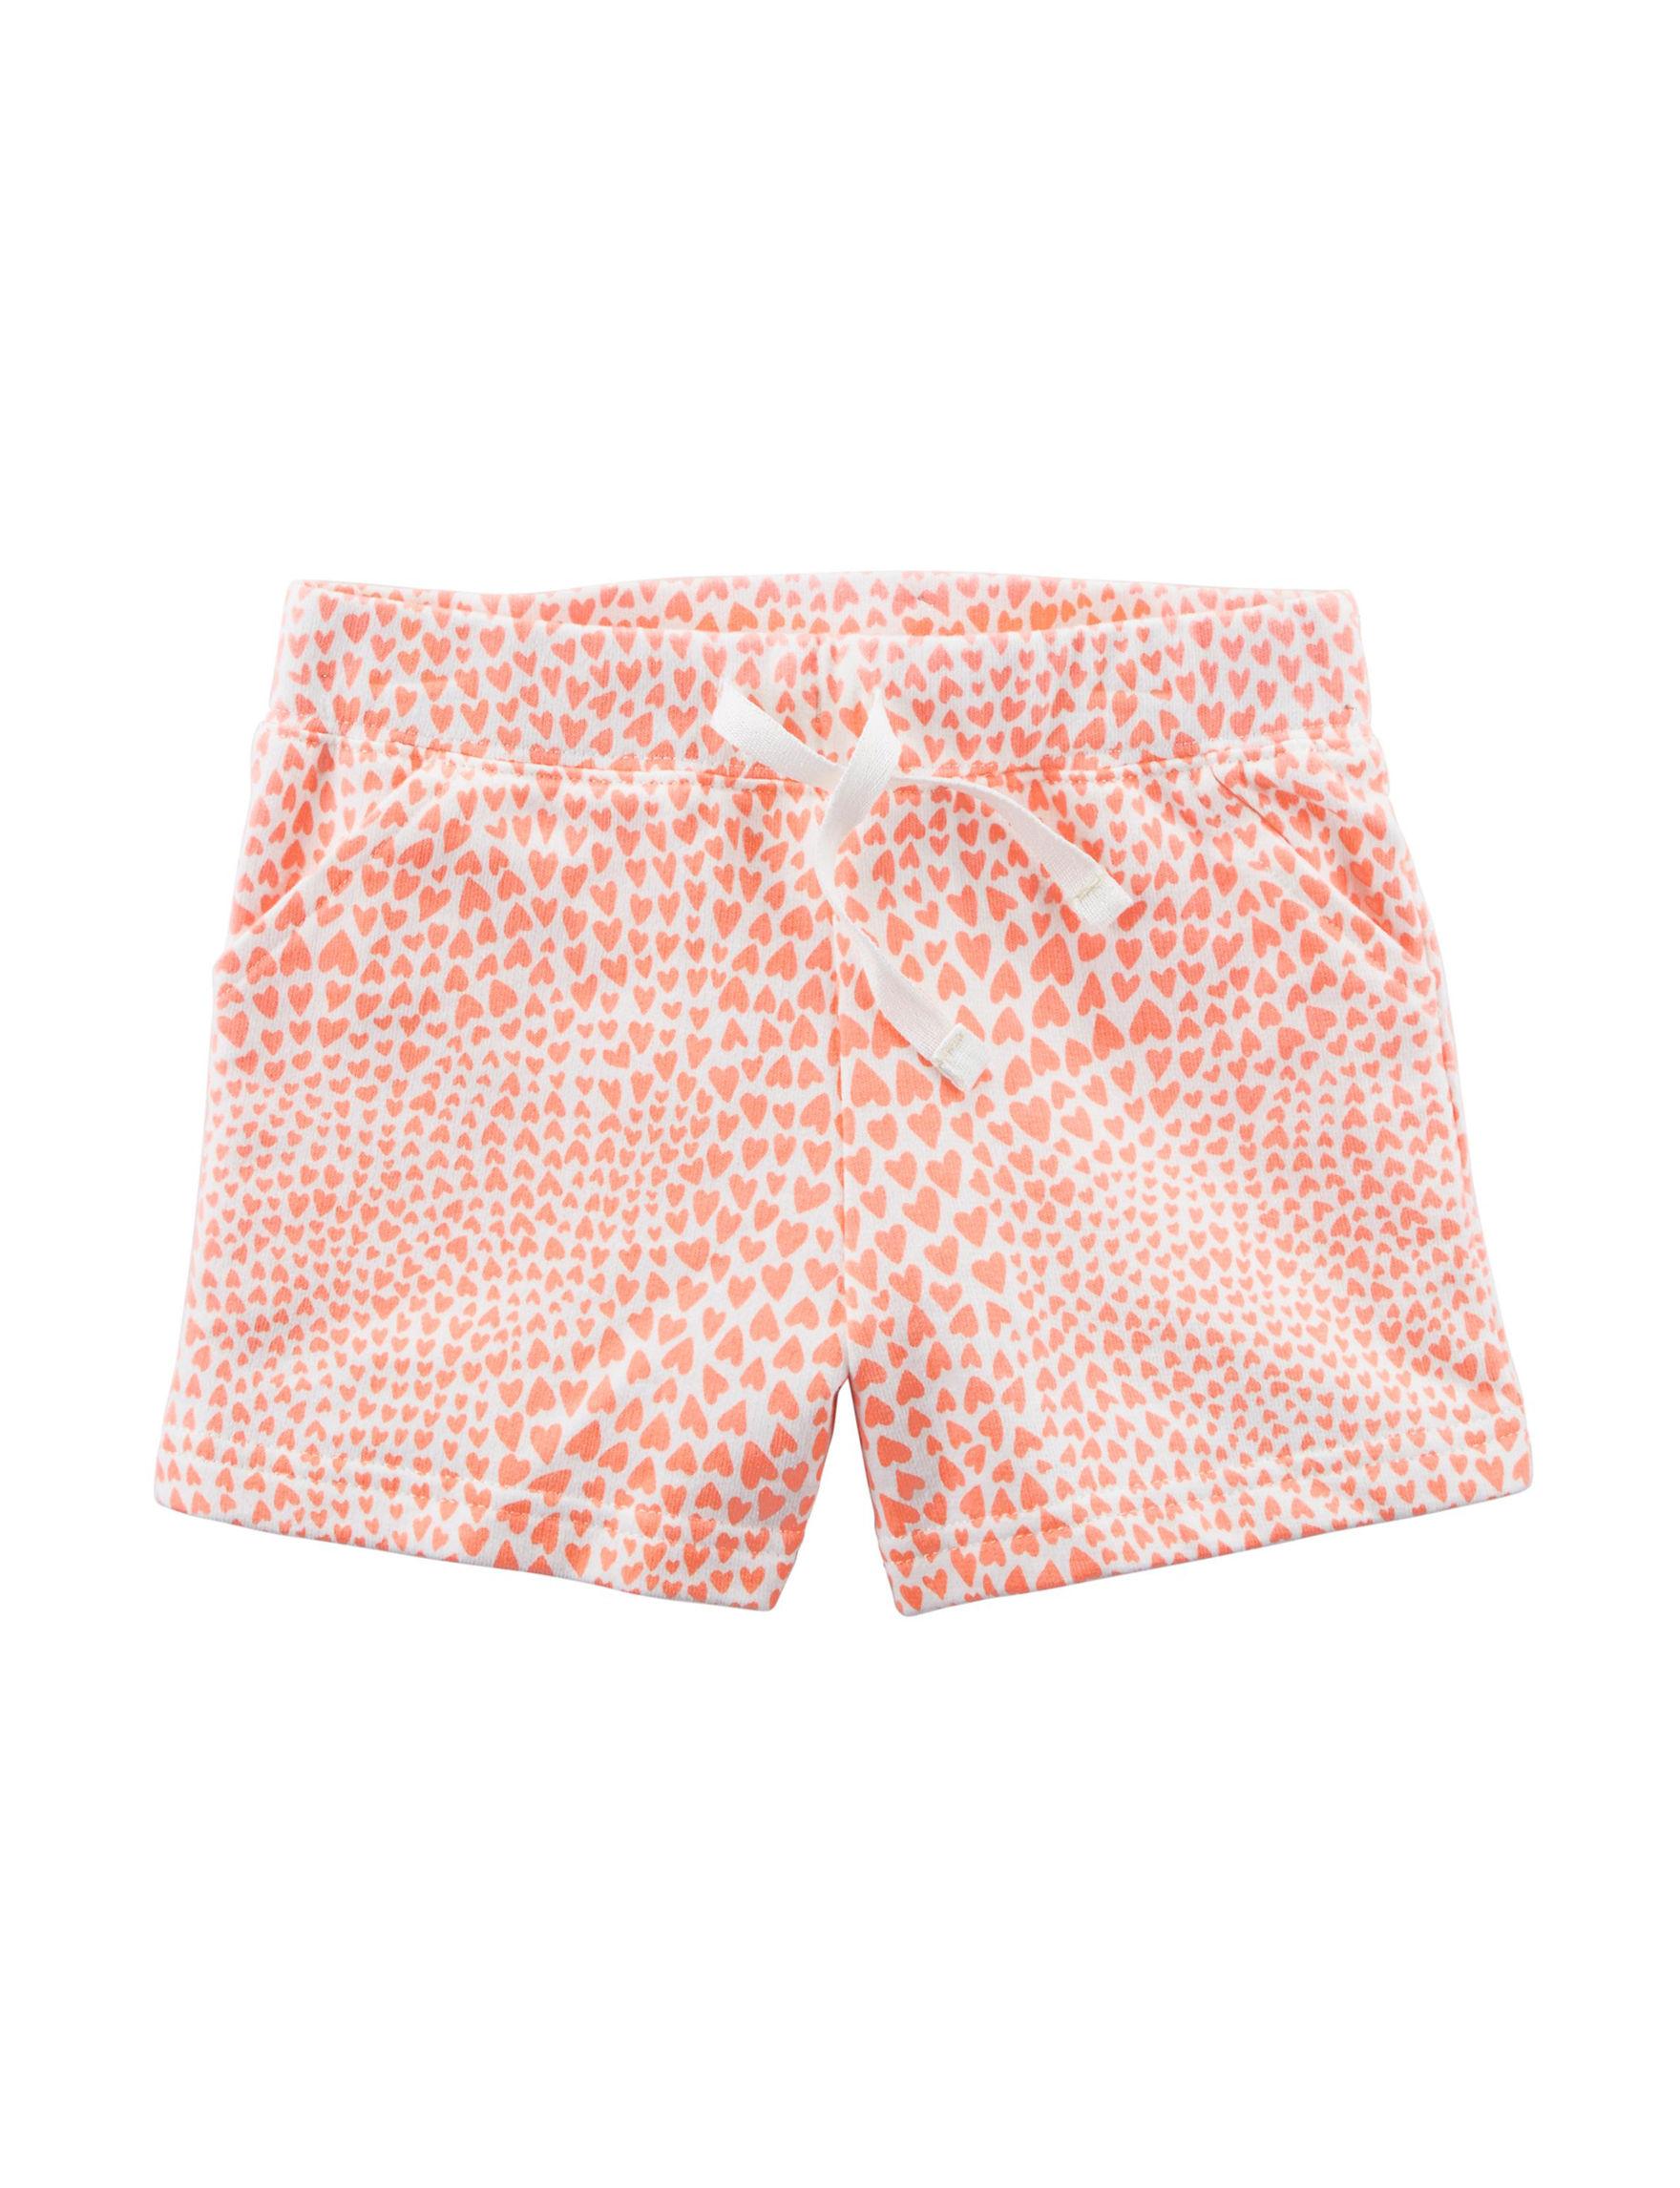 Carter's Orange / White Soft Shorts